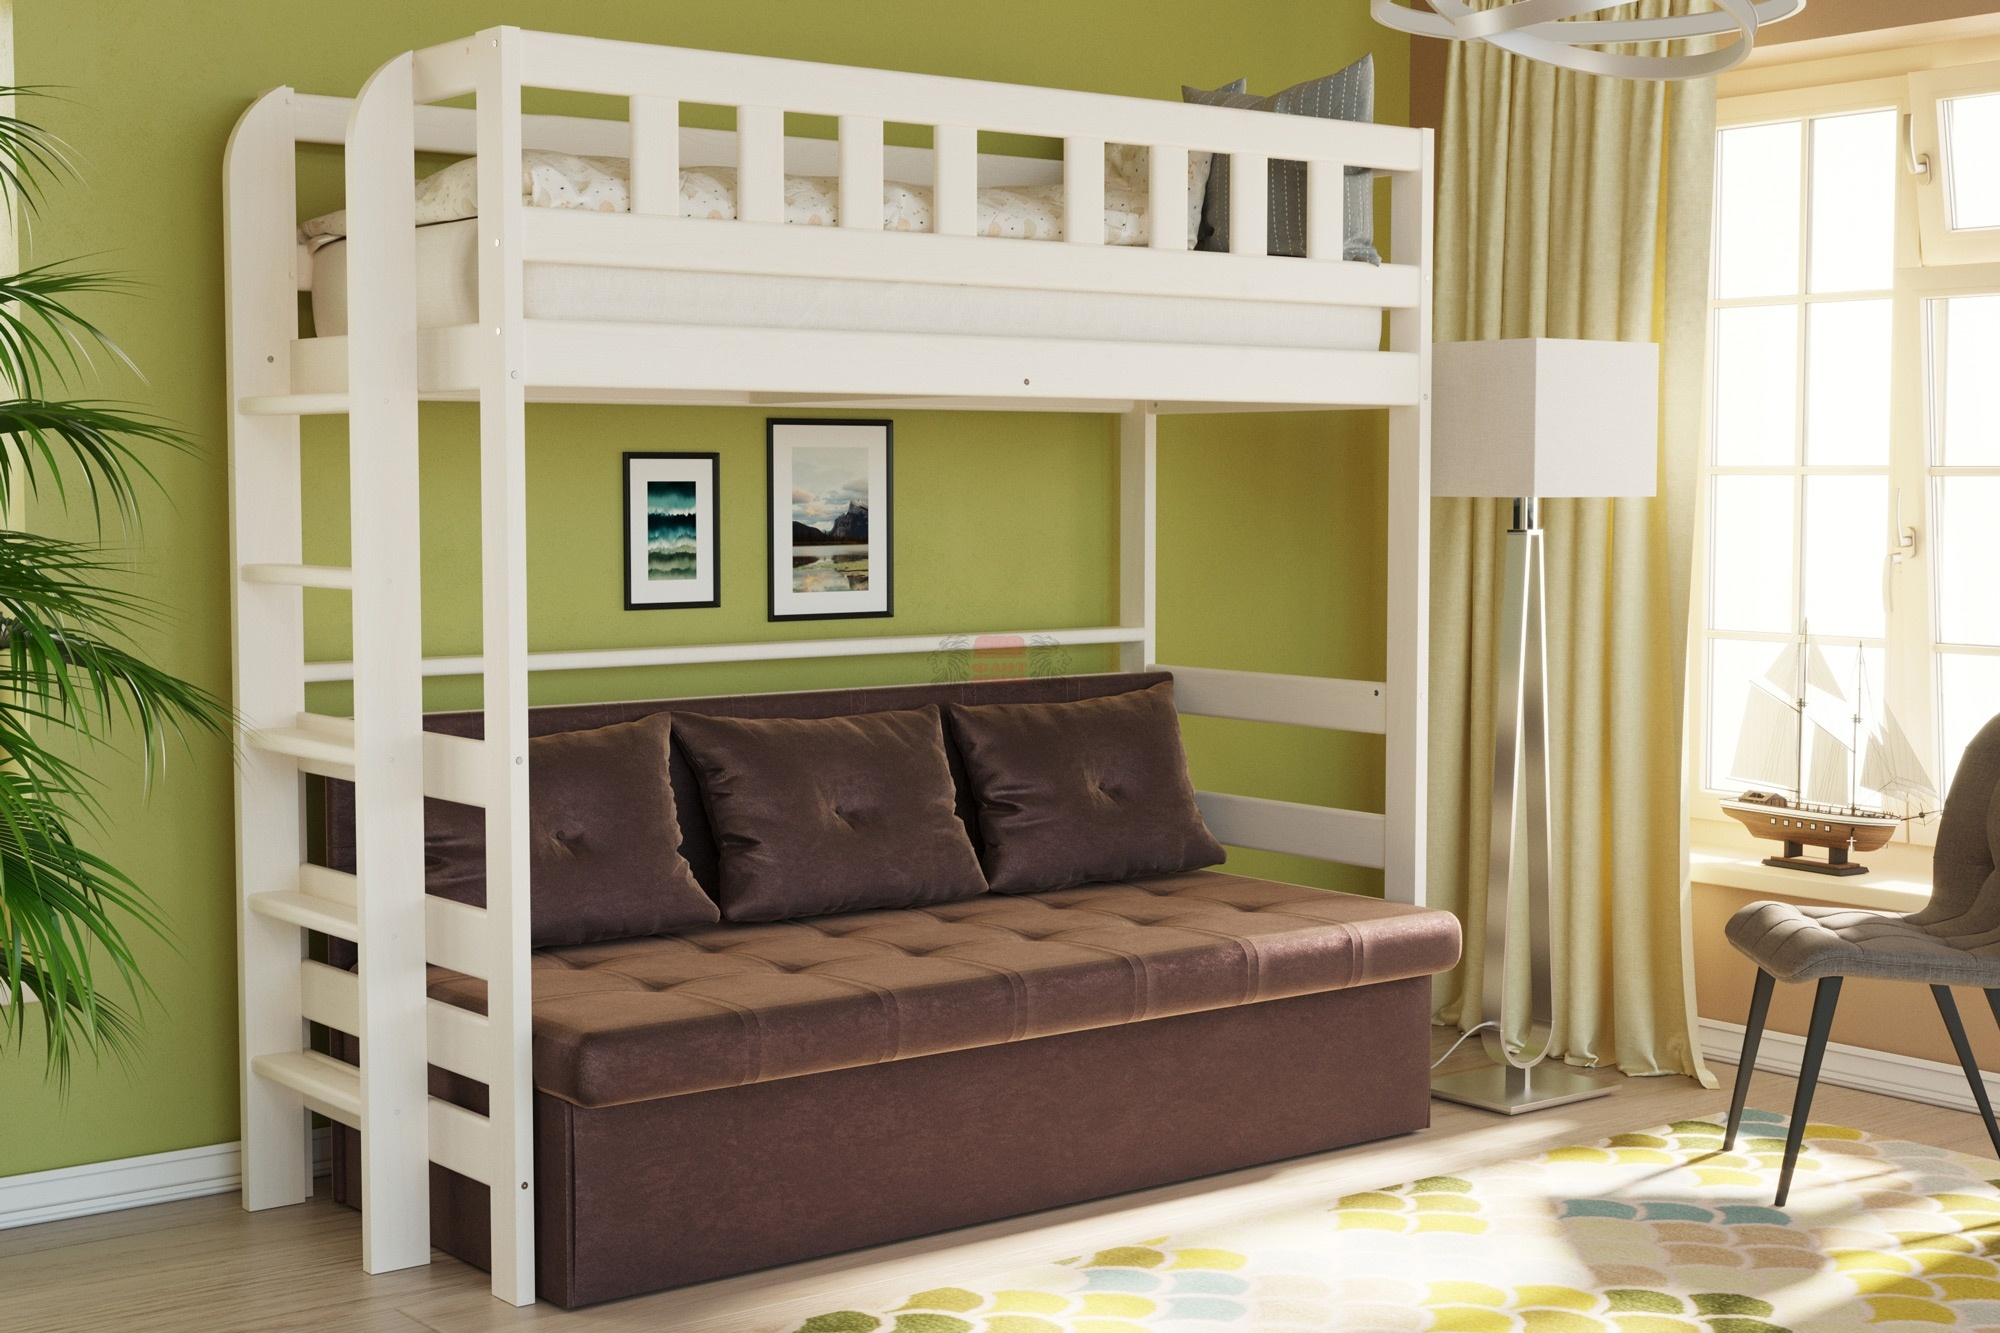 достоинства двухъярусной кровати-дивана